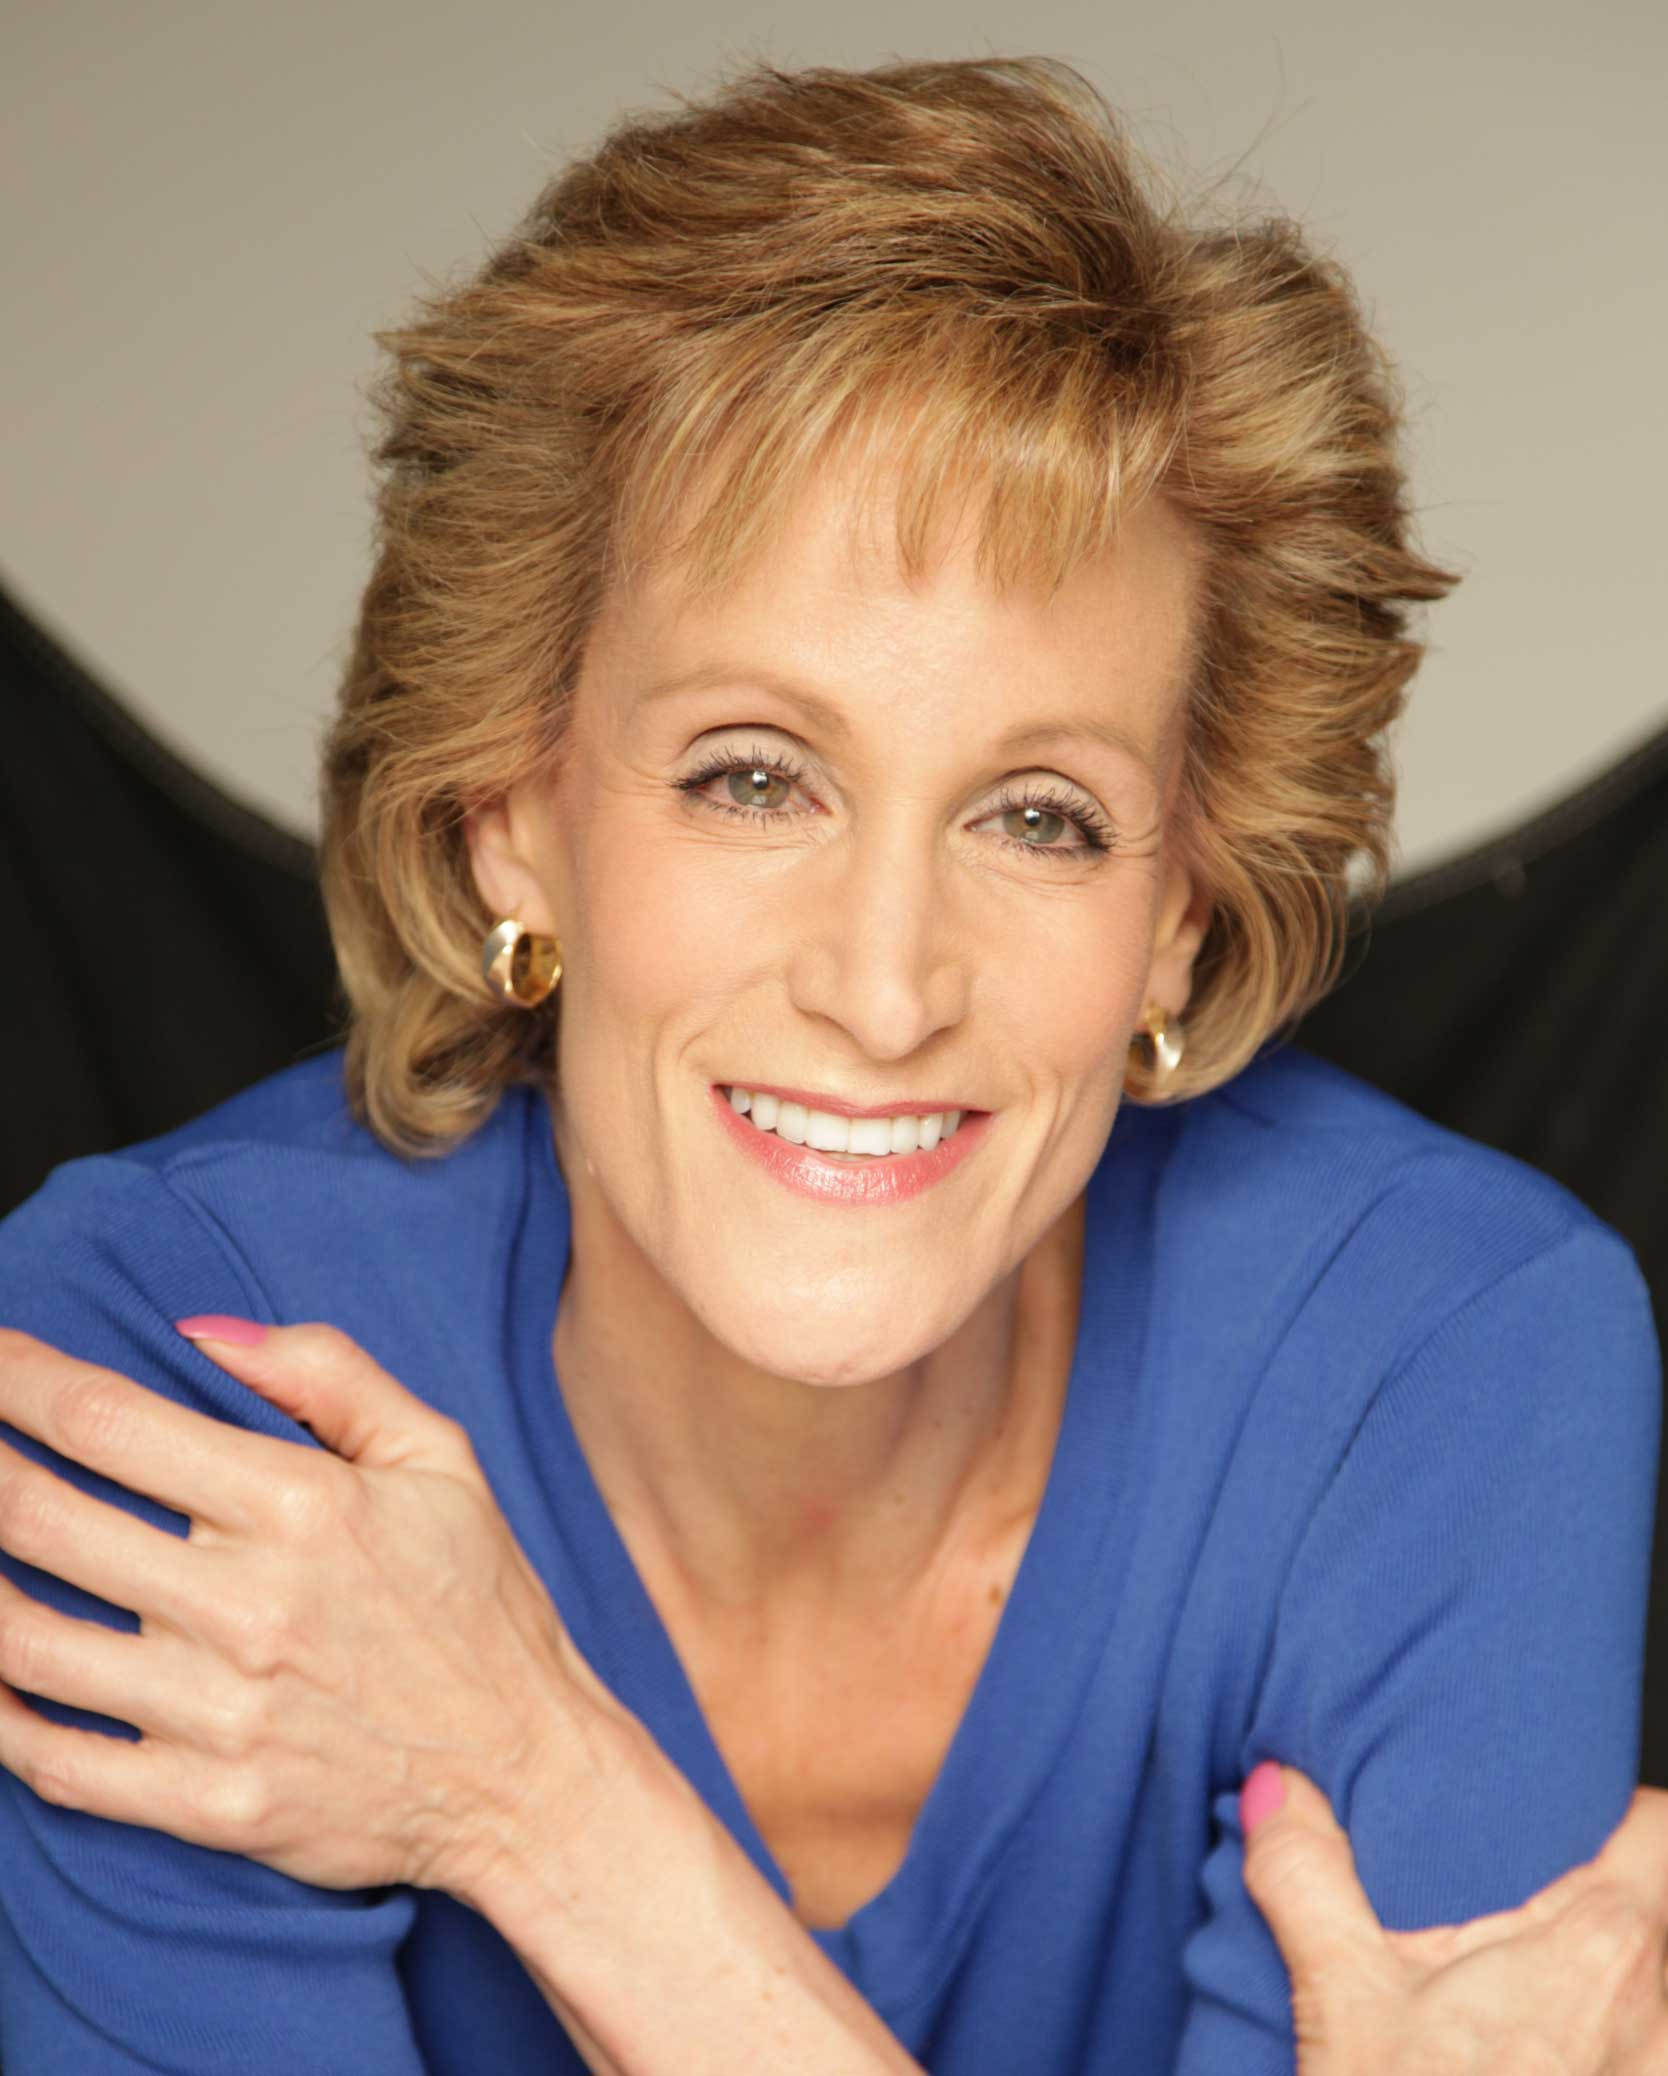 Cheryl Caplow